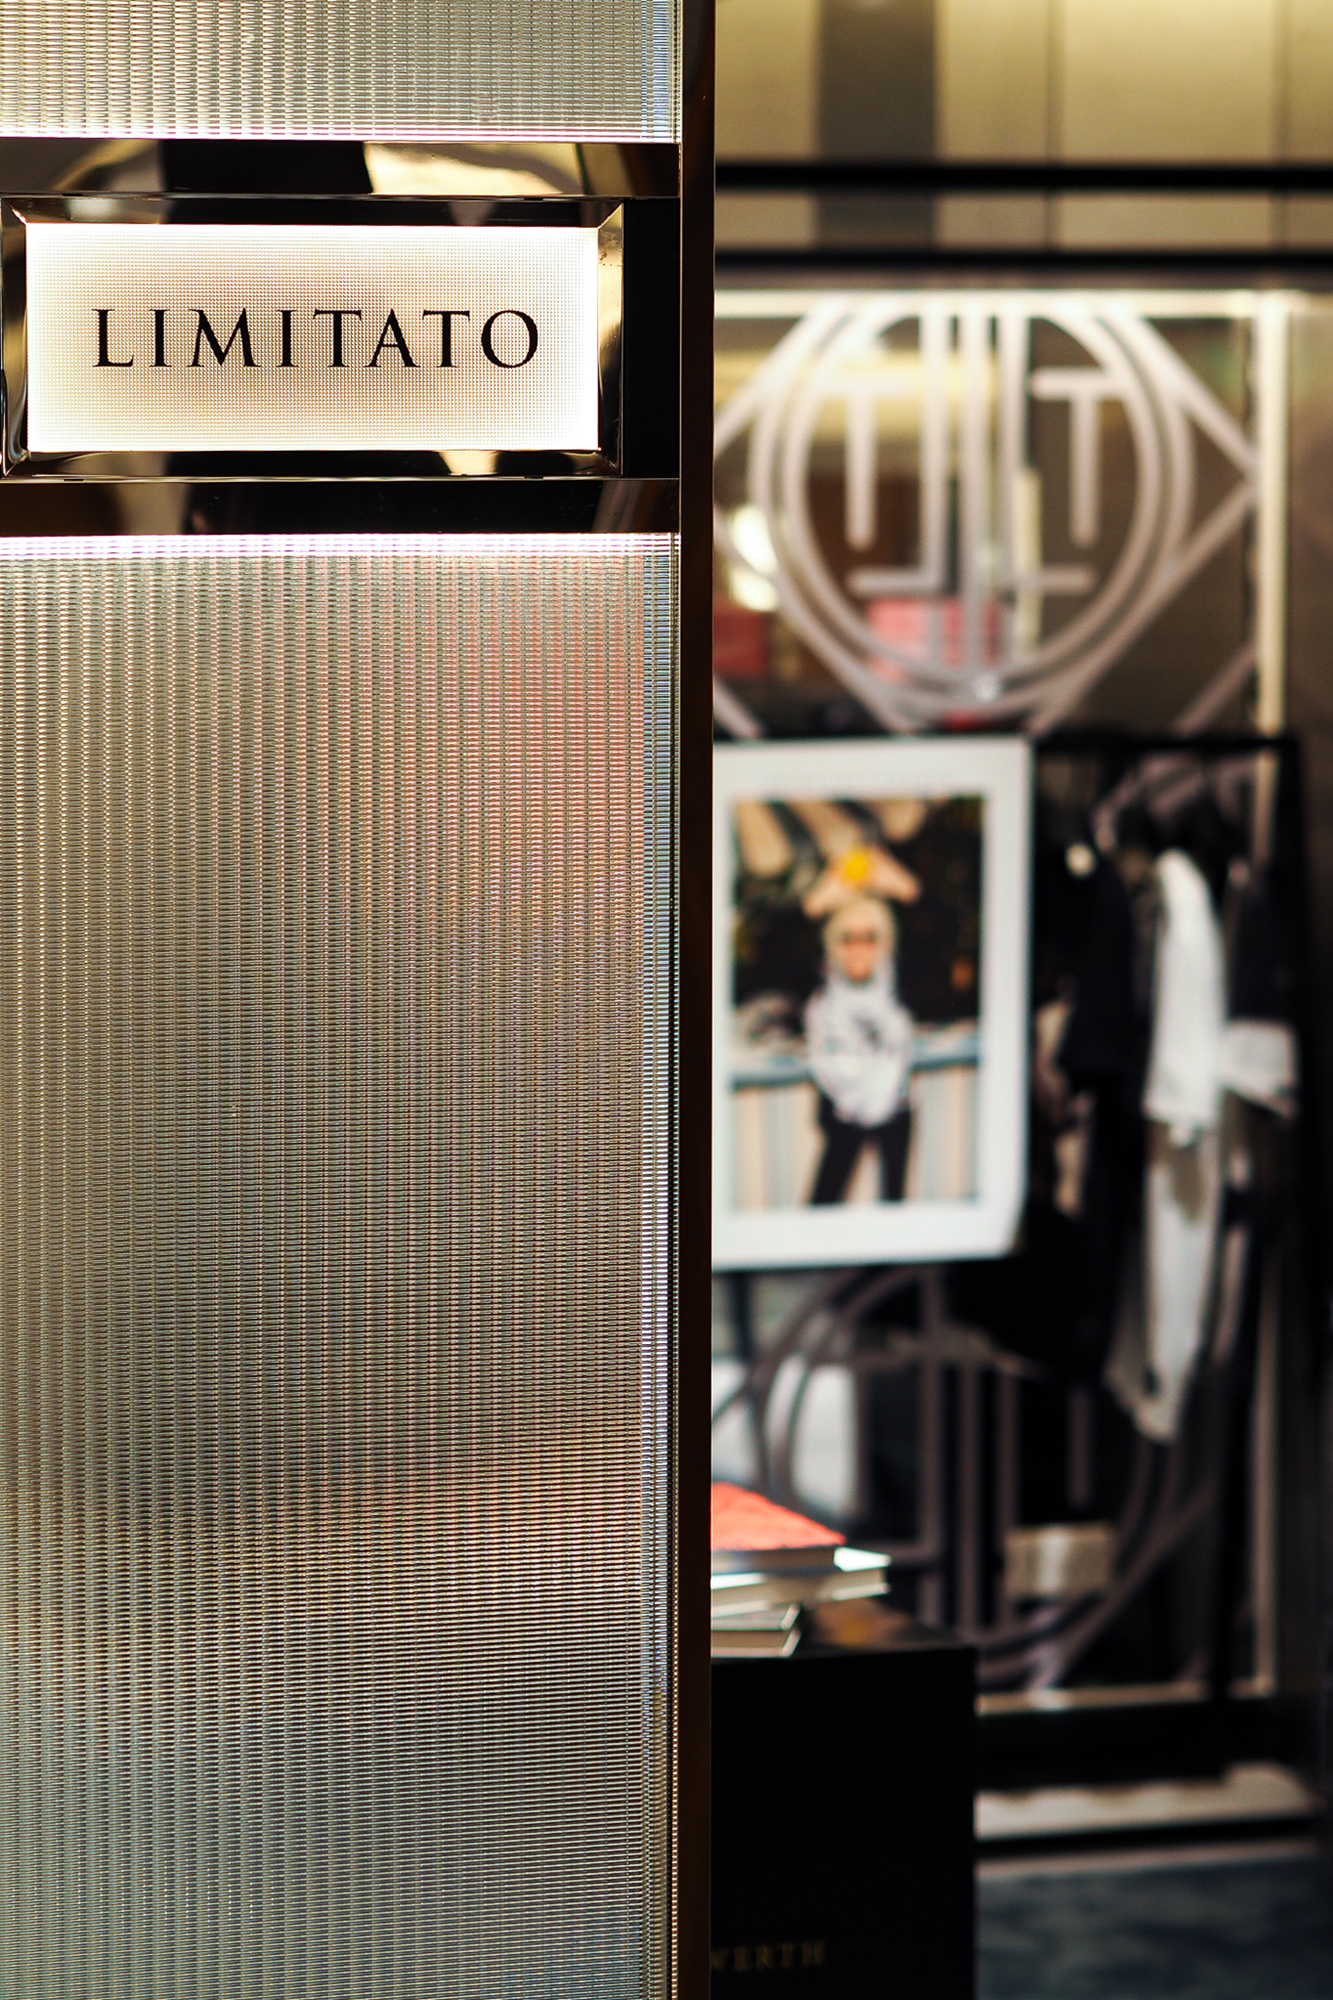 retail design, Limitato, Harrods